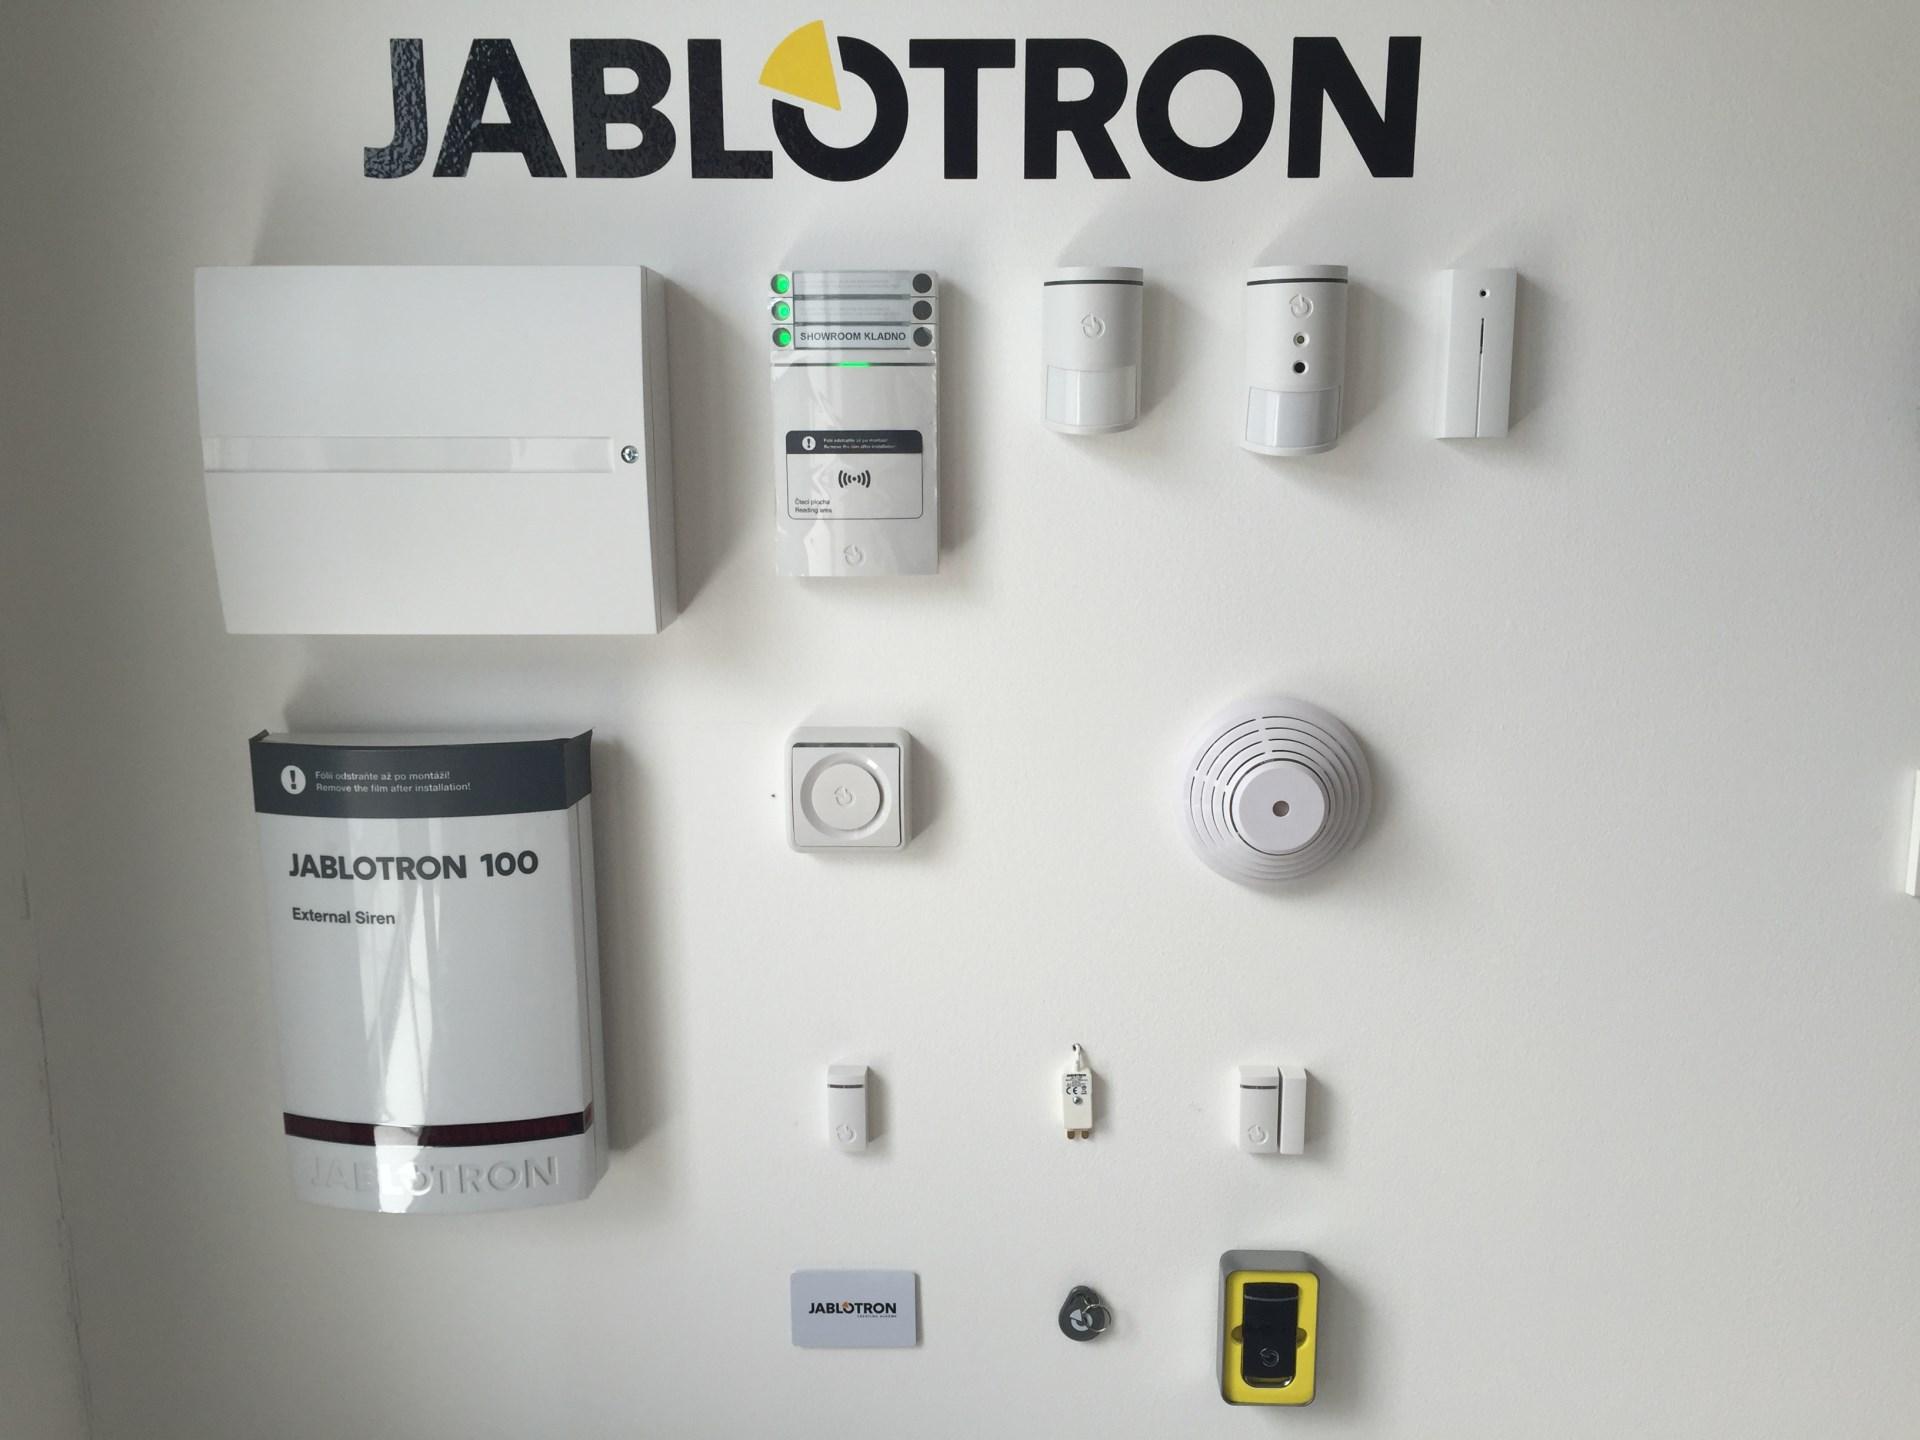 produkty Jablotron